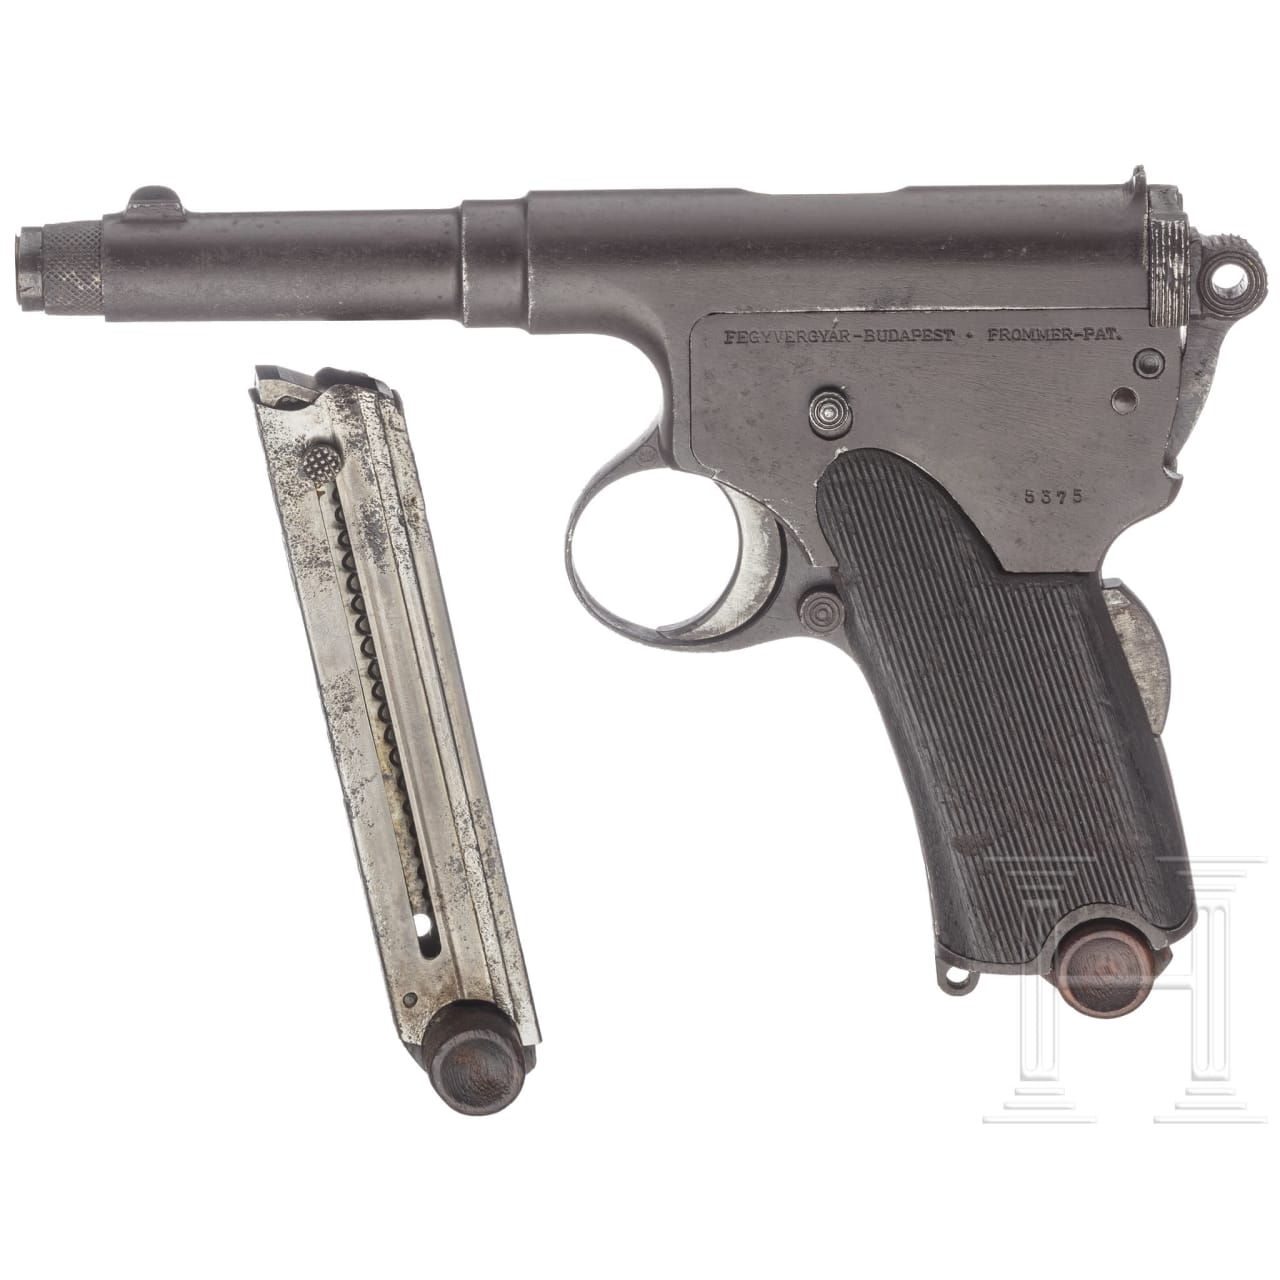 Frommer Mod. 1910, ung. Gendarmerie u.a.